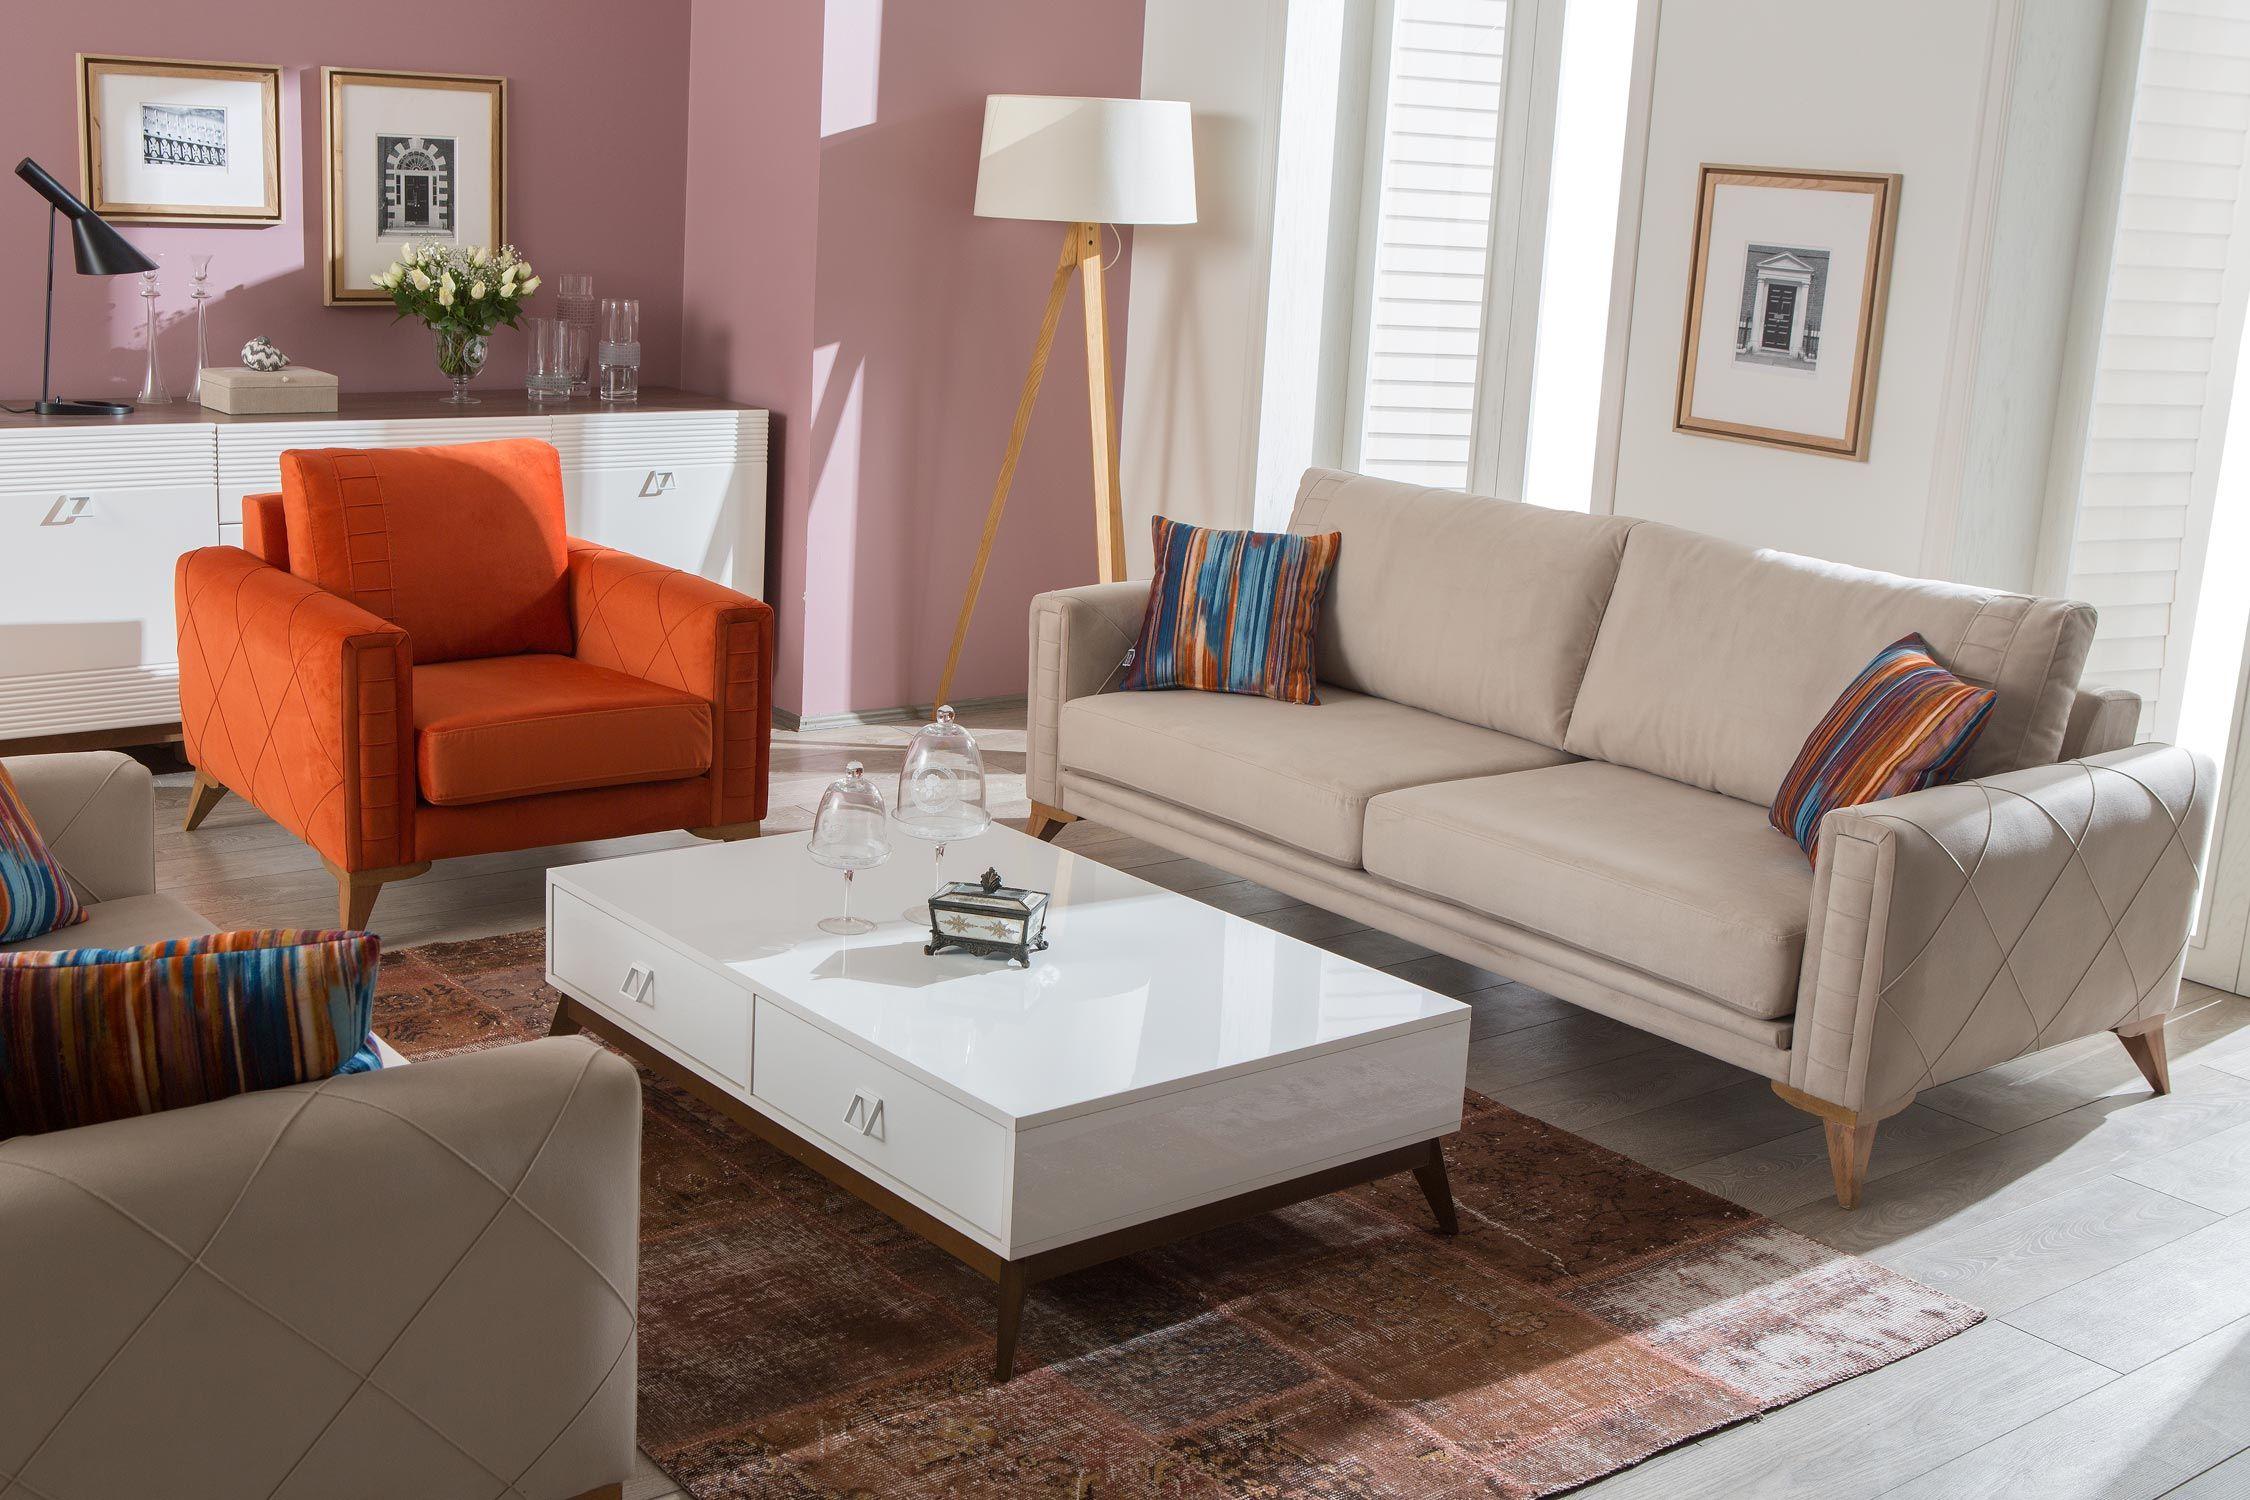 Canada Modern Koltuk Takimi Furniture Mobilya Sofa Koltuk Benimevim Http Www Benimevim Com Tr U2319 89 Mobilya Fikirleri Mobilya Oturma Odasi Takimlari